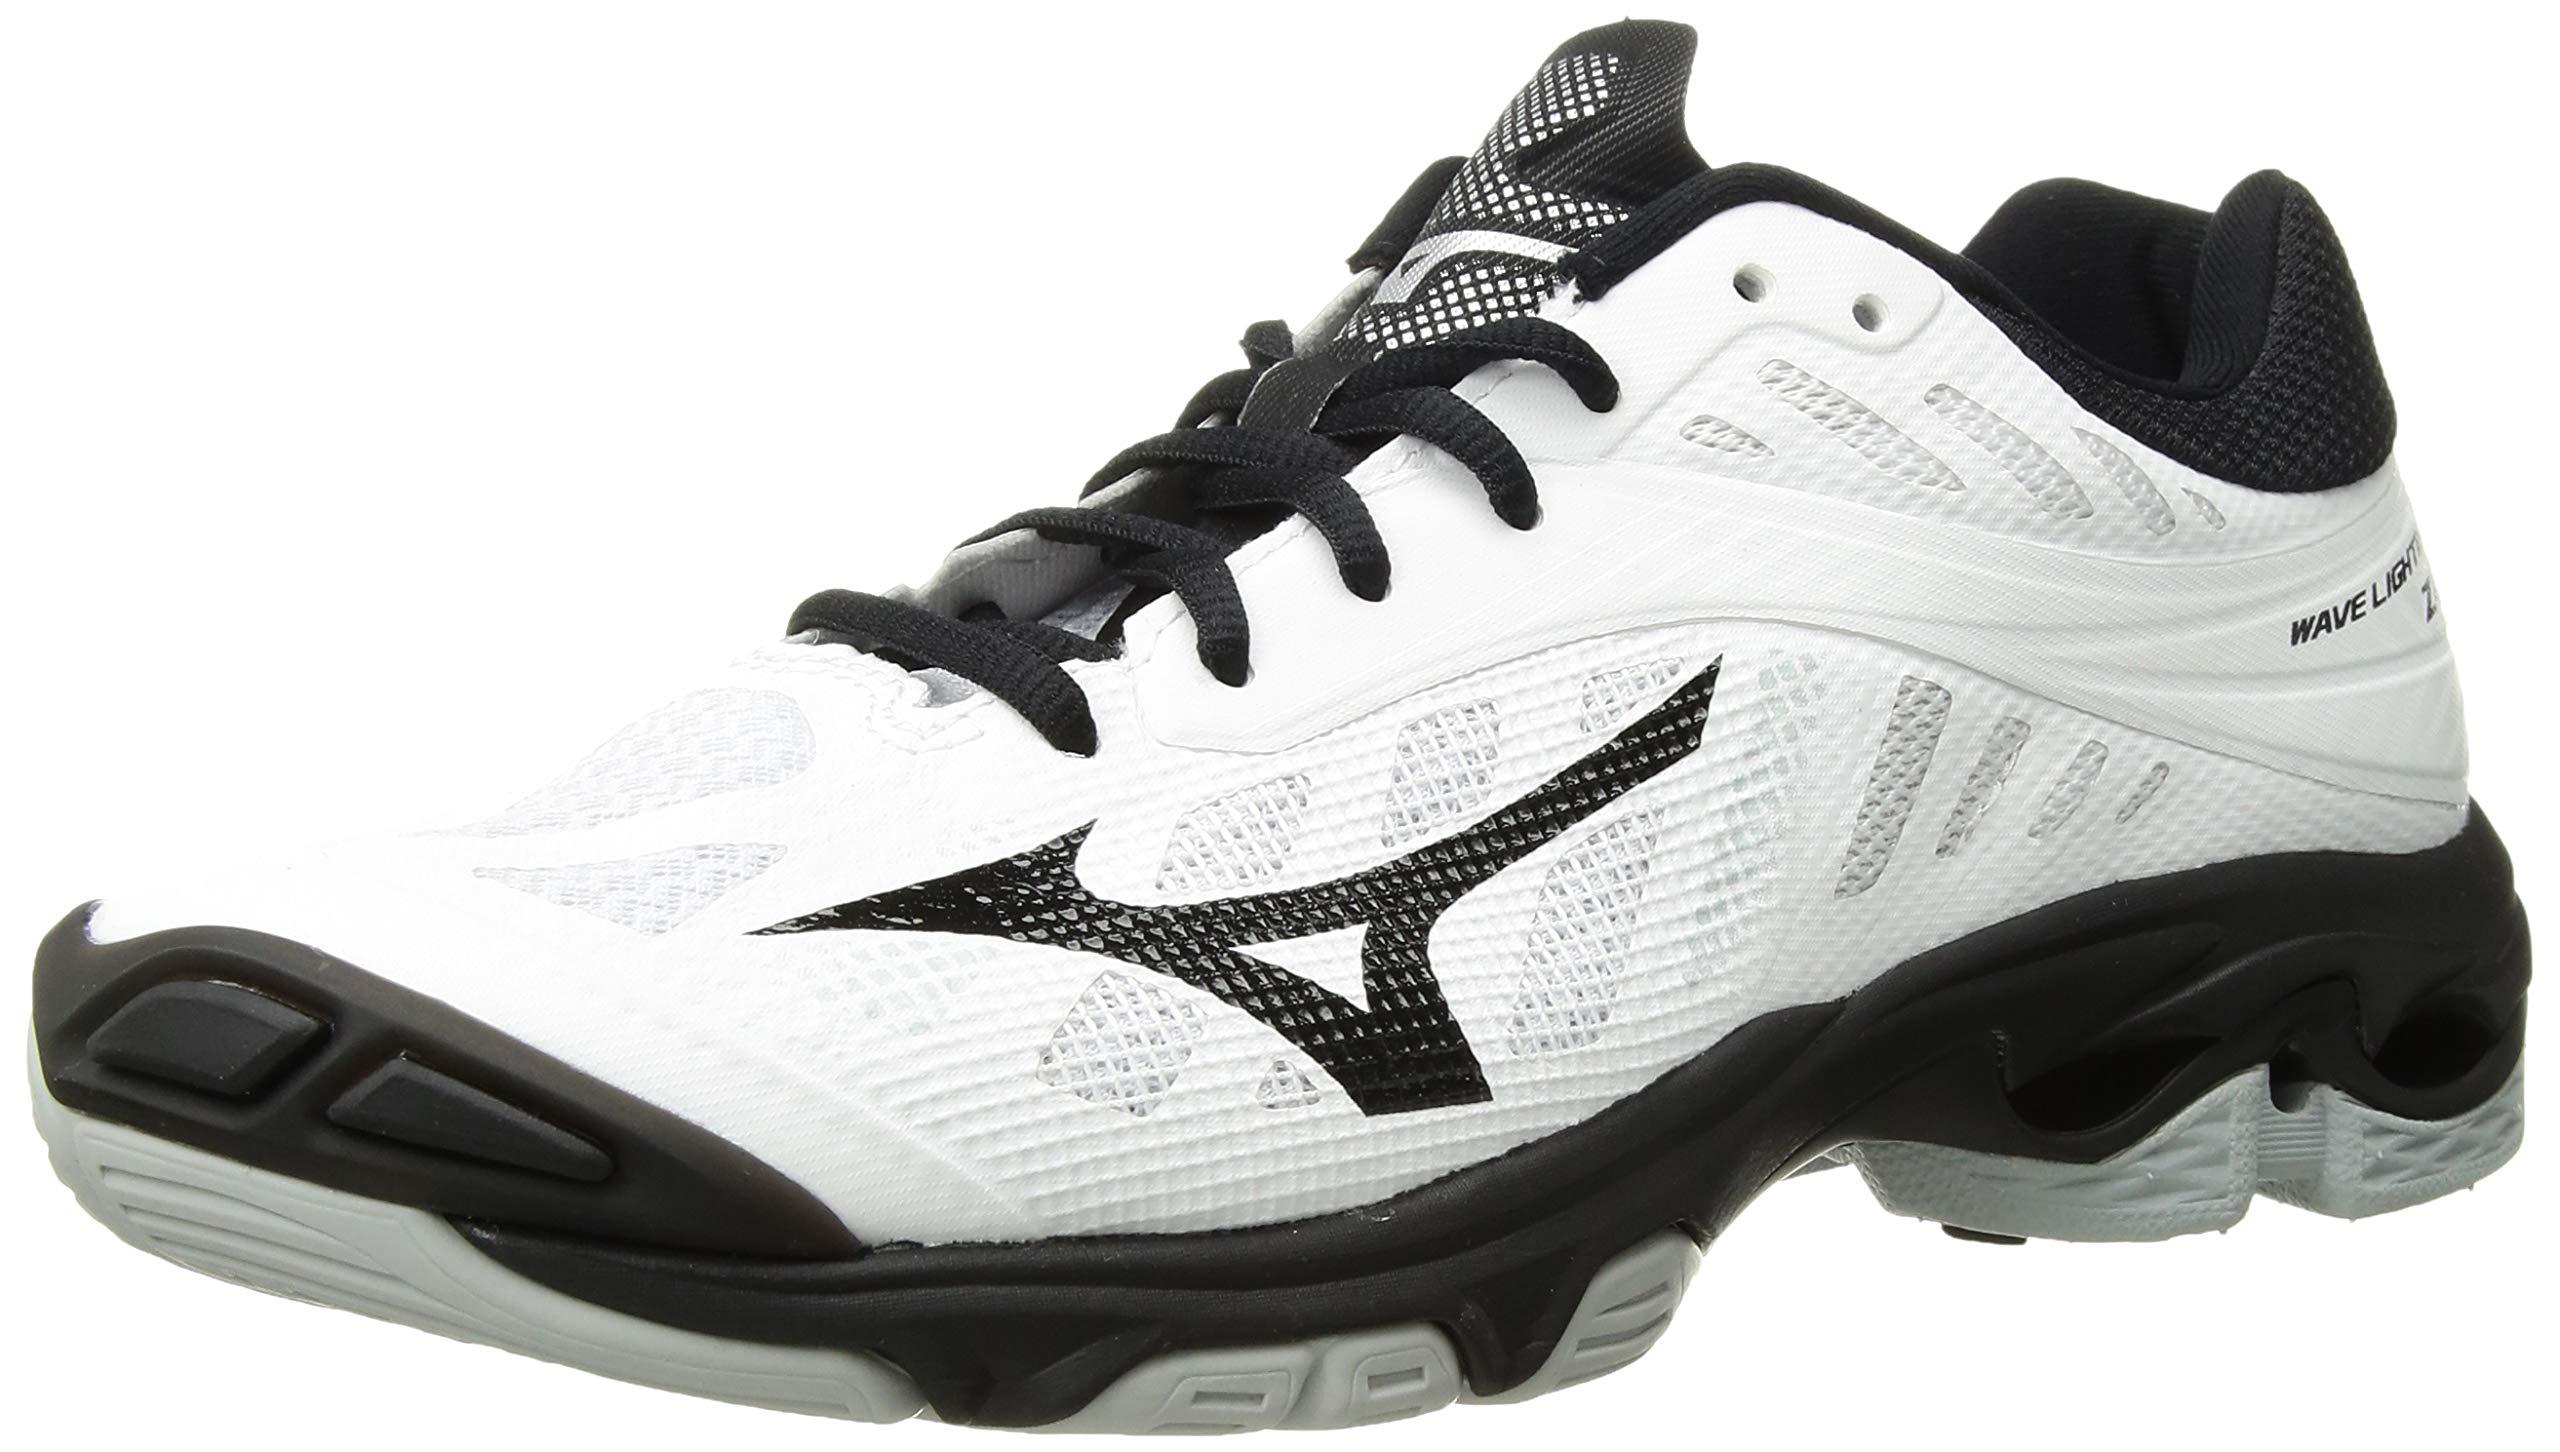 Mizuno Wave Lightning Z4 Volleyball Shoes, White/Black Women's 6 B US